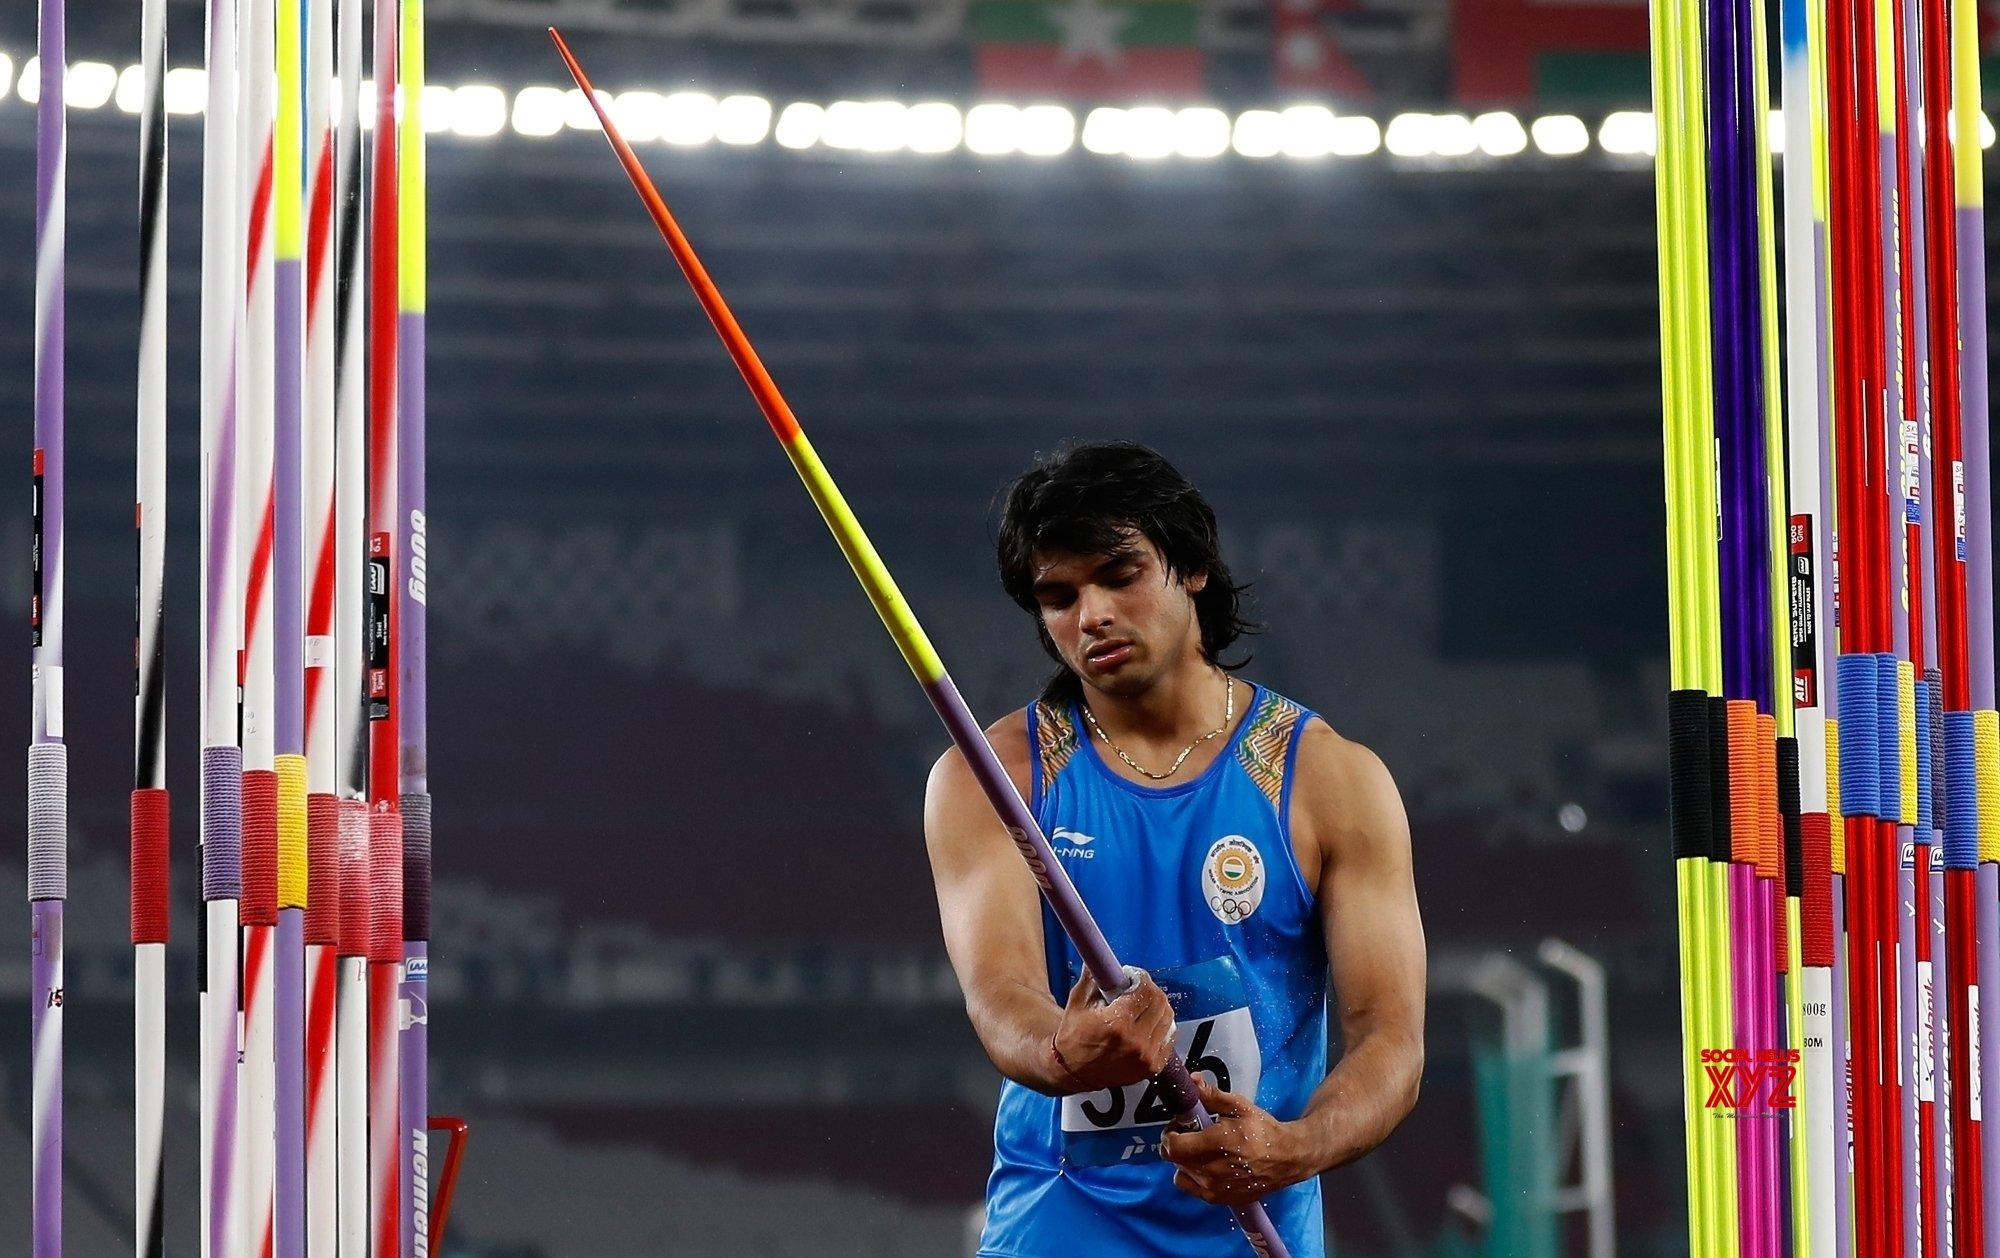 Chopra wins javelin gold at Meeting Cidade de Lisboa